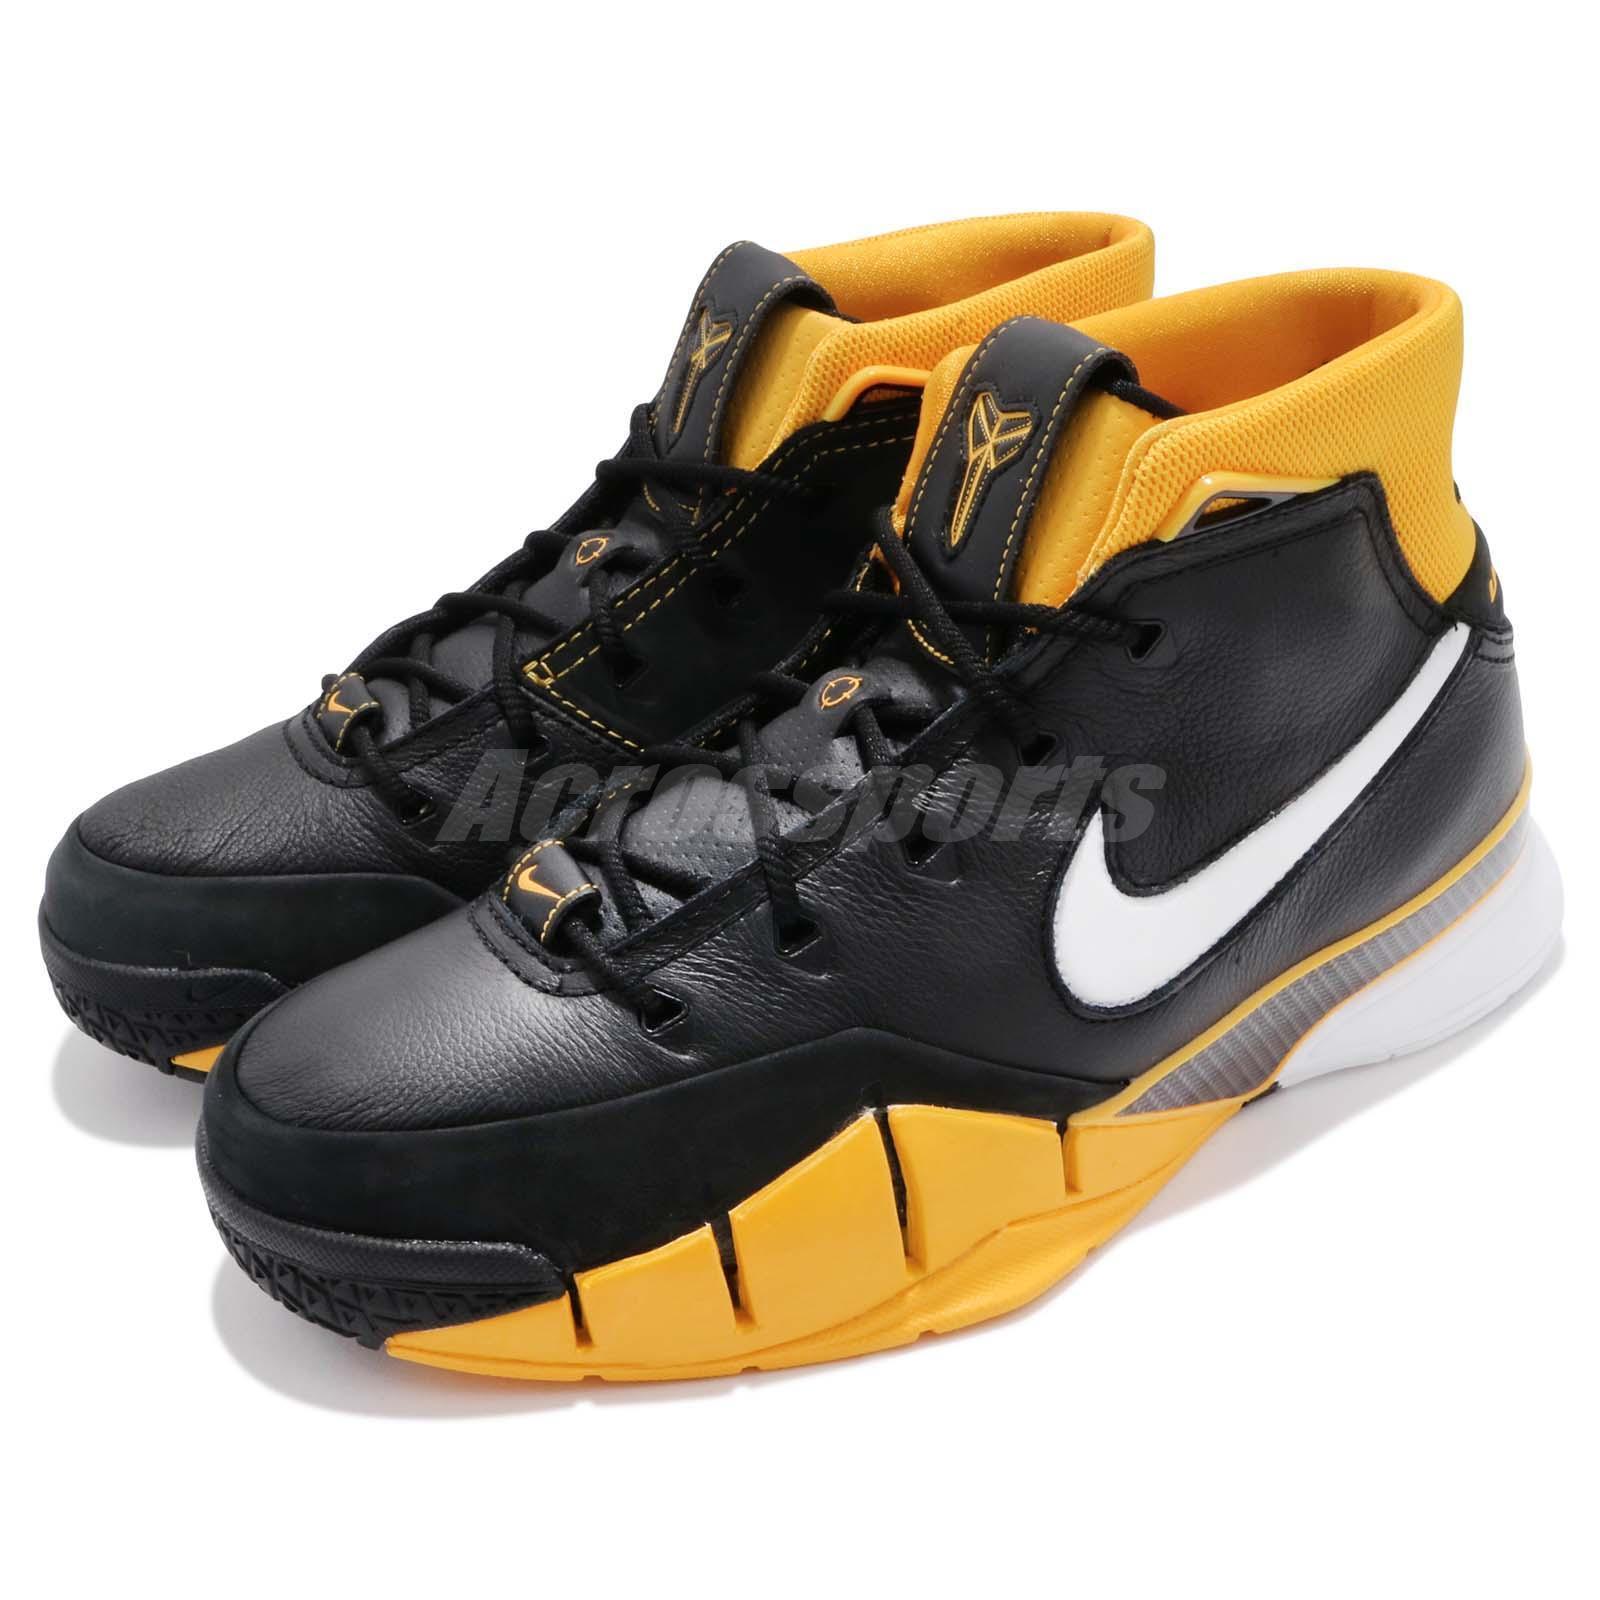 Nike Zoom Kobe 1 Protro Del Sol Bryant Varsity Maize Yellow Retro Uomo AQ2728-003